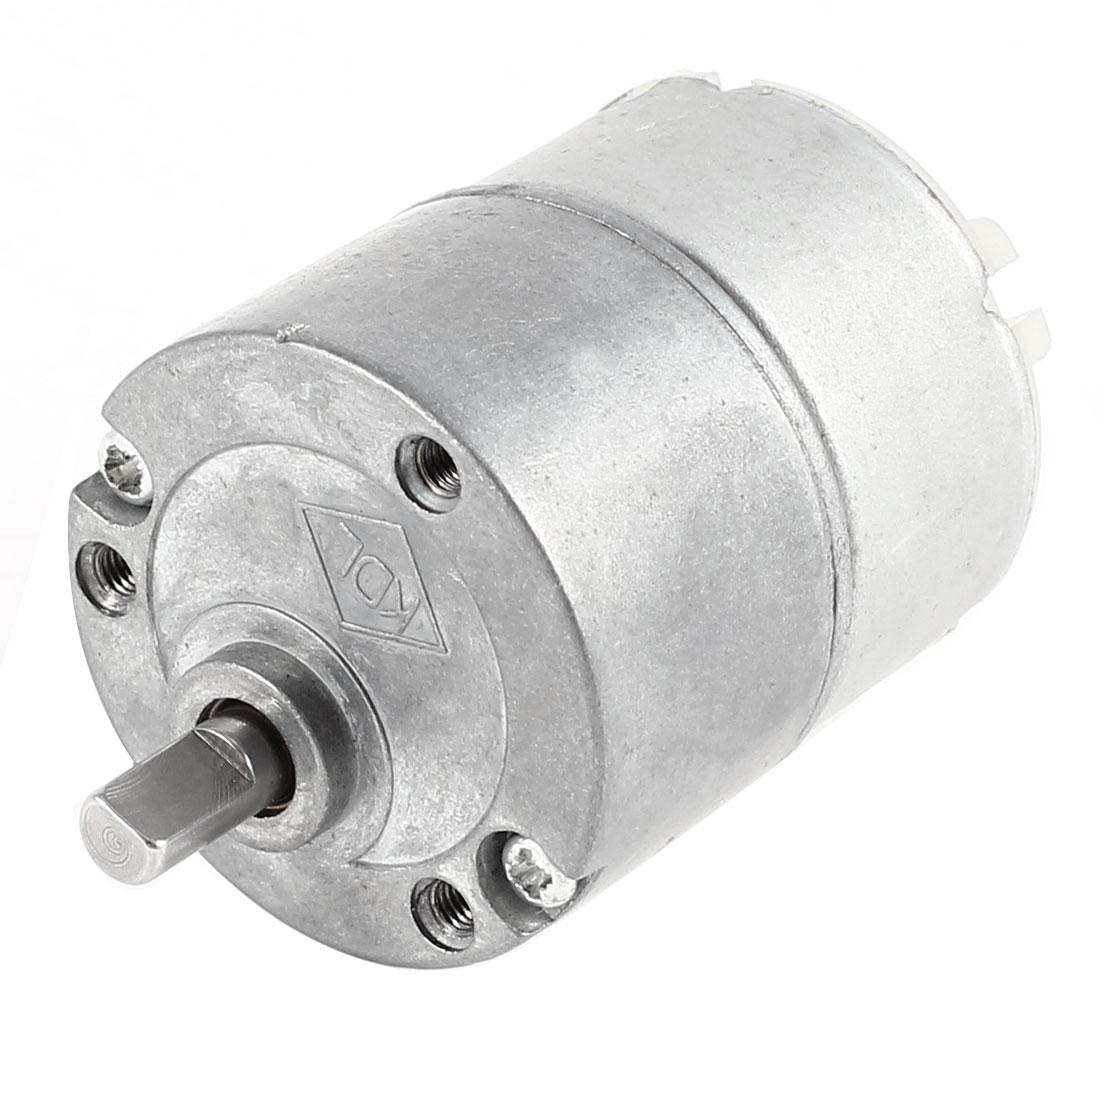 JGB33-500T DC 12V 188RPM 5mm Diameter Shaft Electric Gear Box Speed Reduce Motor